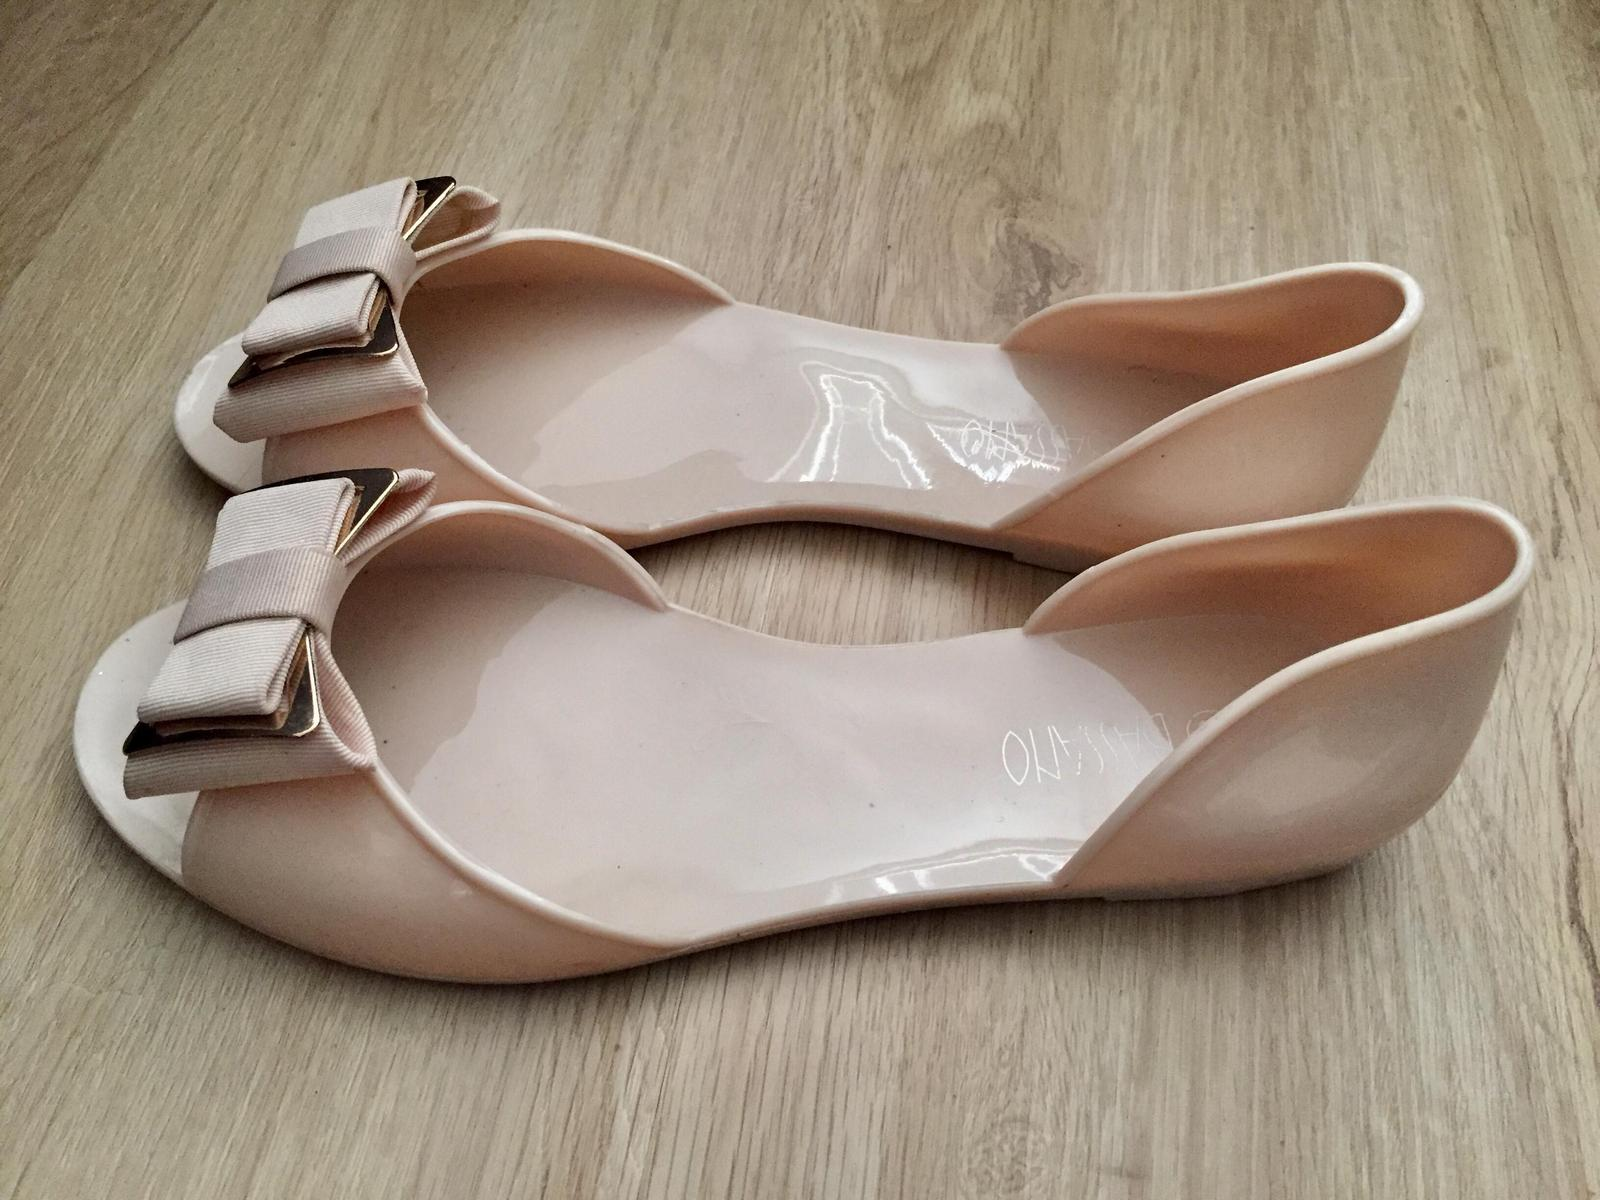 Sandále s otvorenou špičkou, 1x obuté - Obrázok č. 2